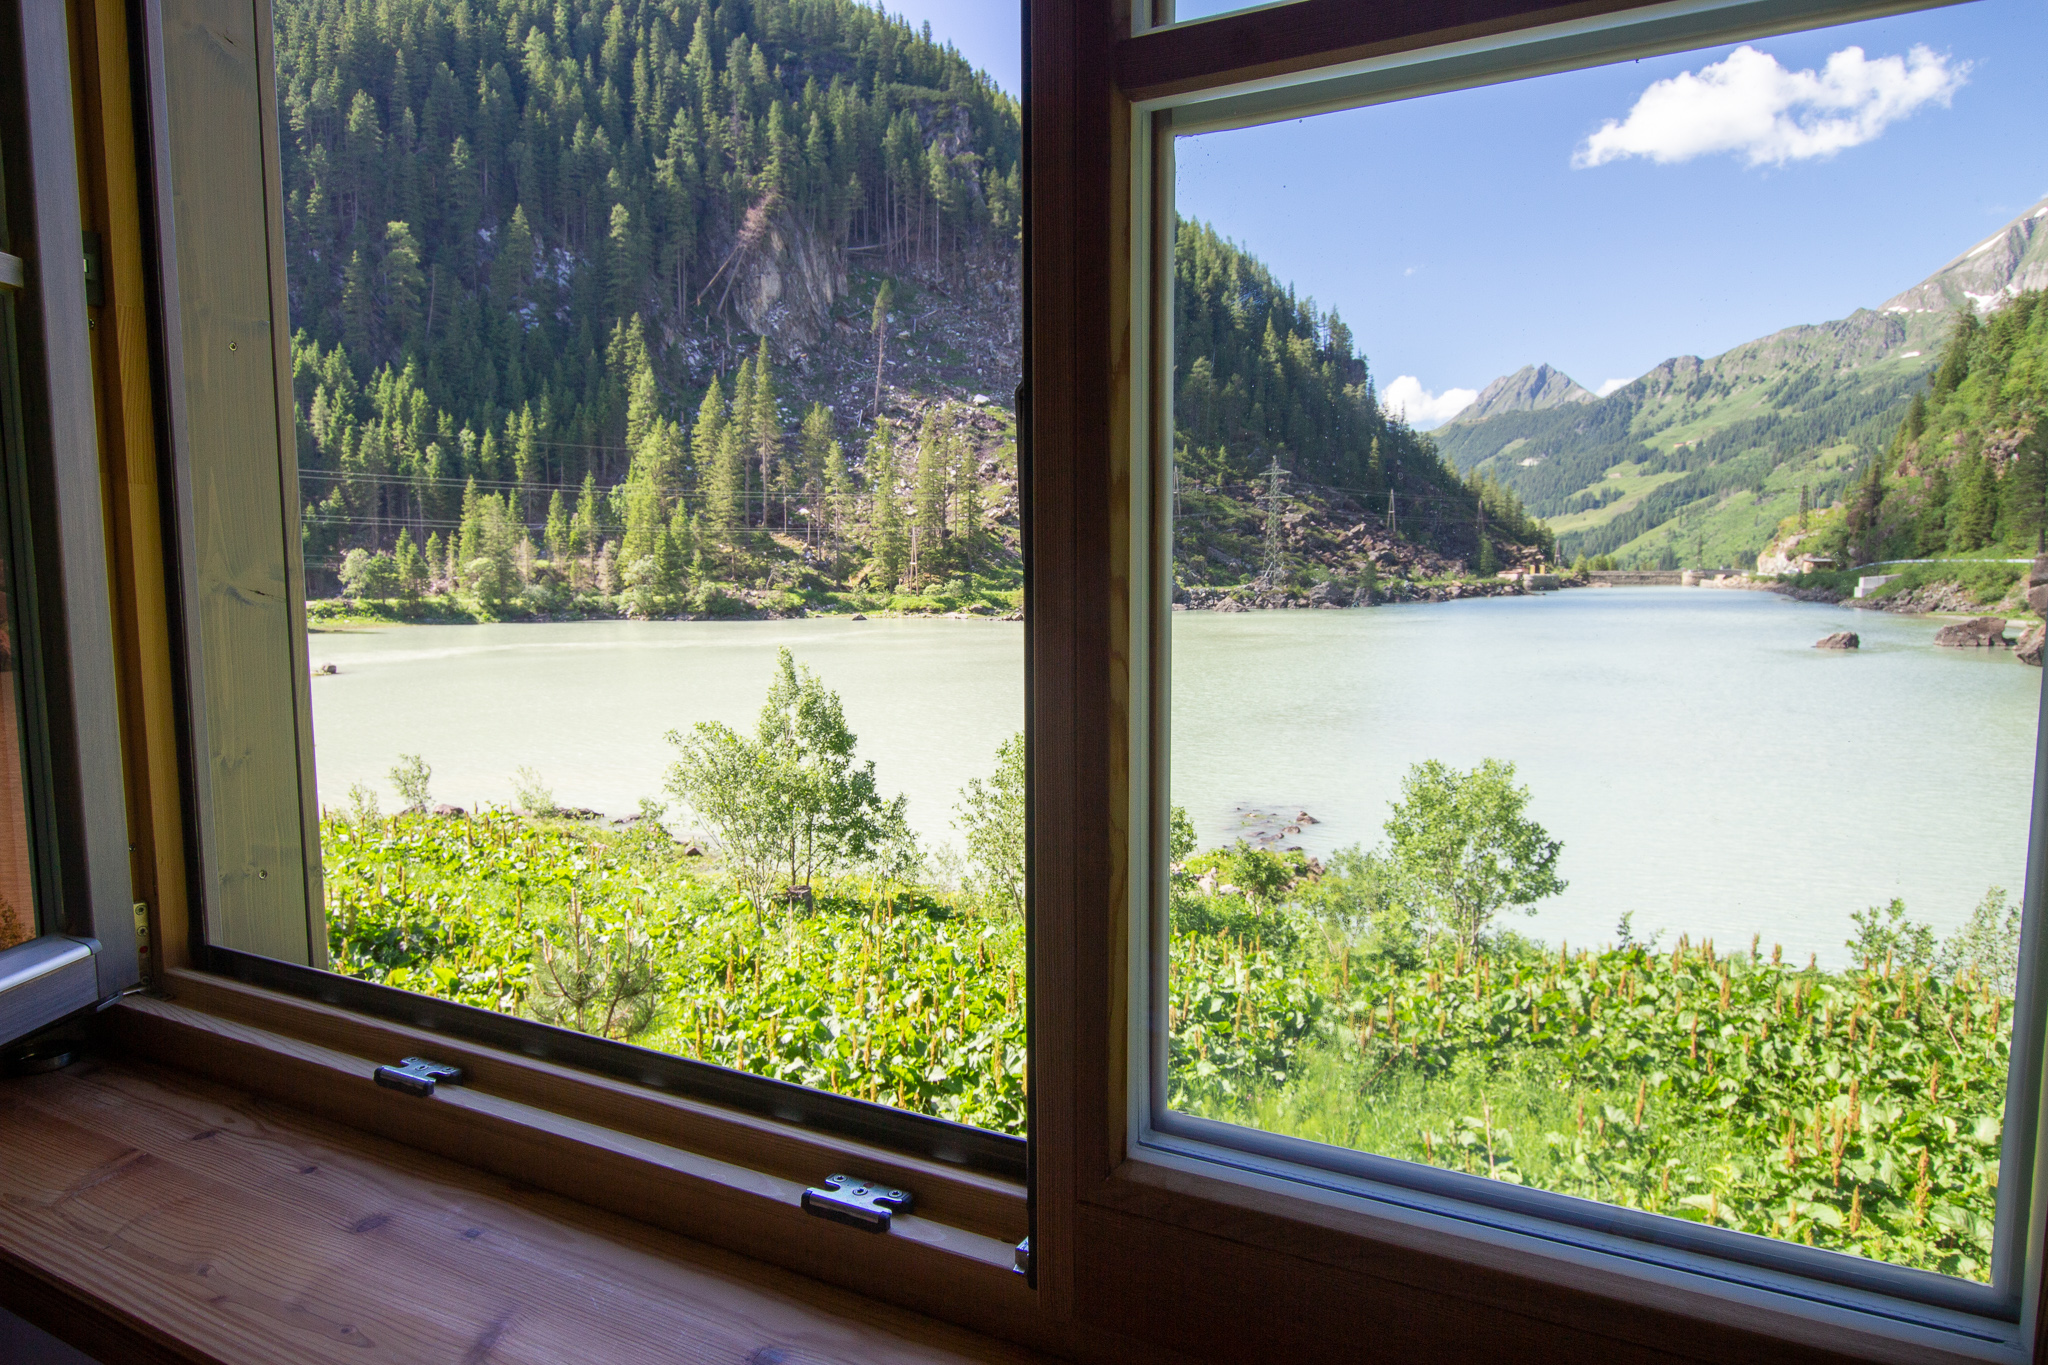 Maison de vacances Lodge Seeblick am Skilift und Bergsee für 5 (2636751), Uttendorf, Pinzgau, Salzbourg, Autriche, image 10